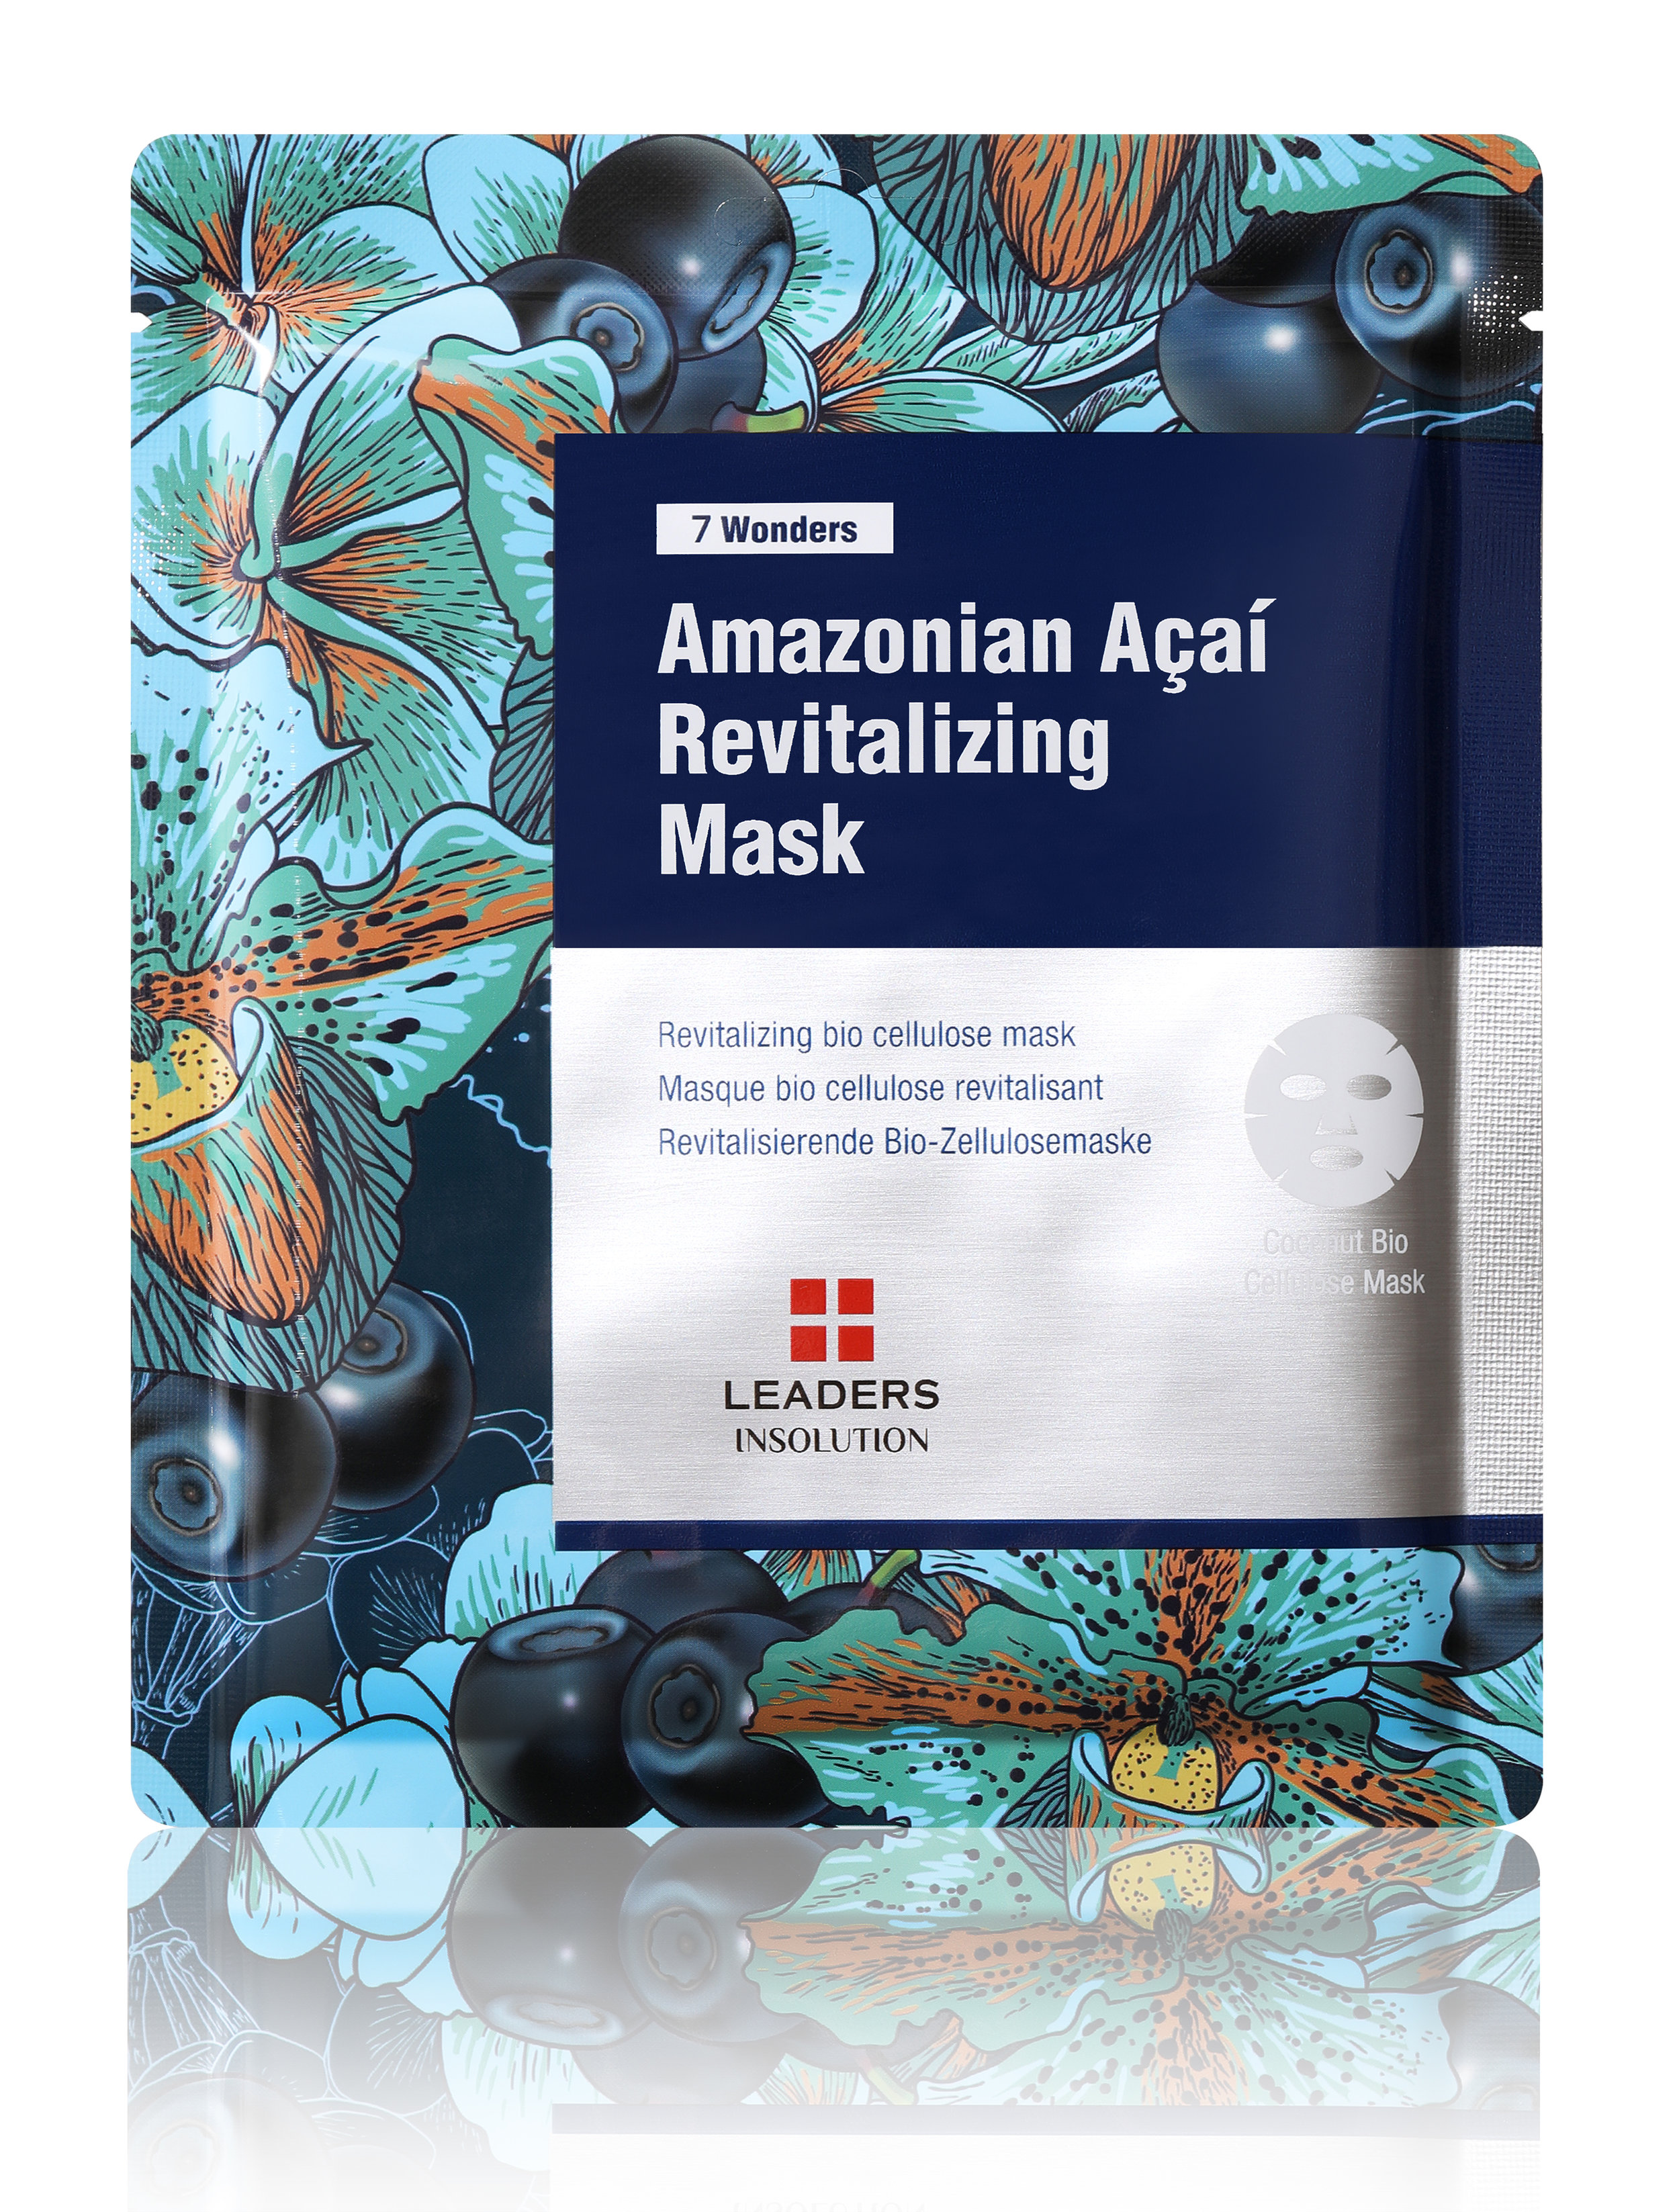 Insolution_7wonders_Amazonian acai_UNI_파우치_전면.jpg